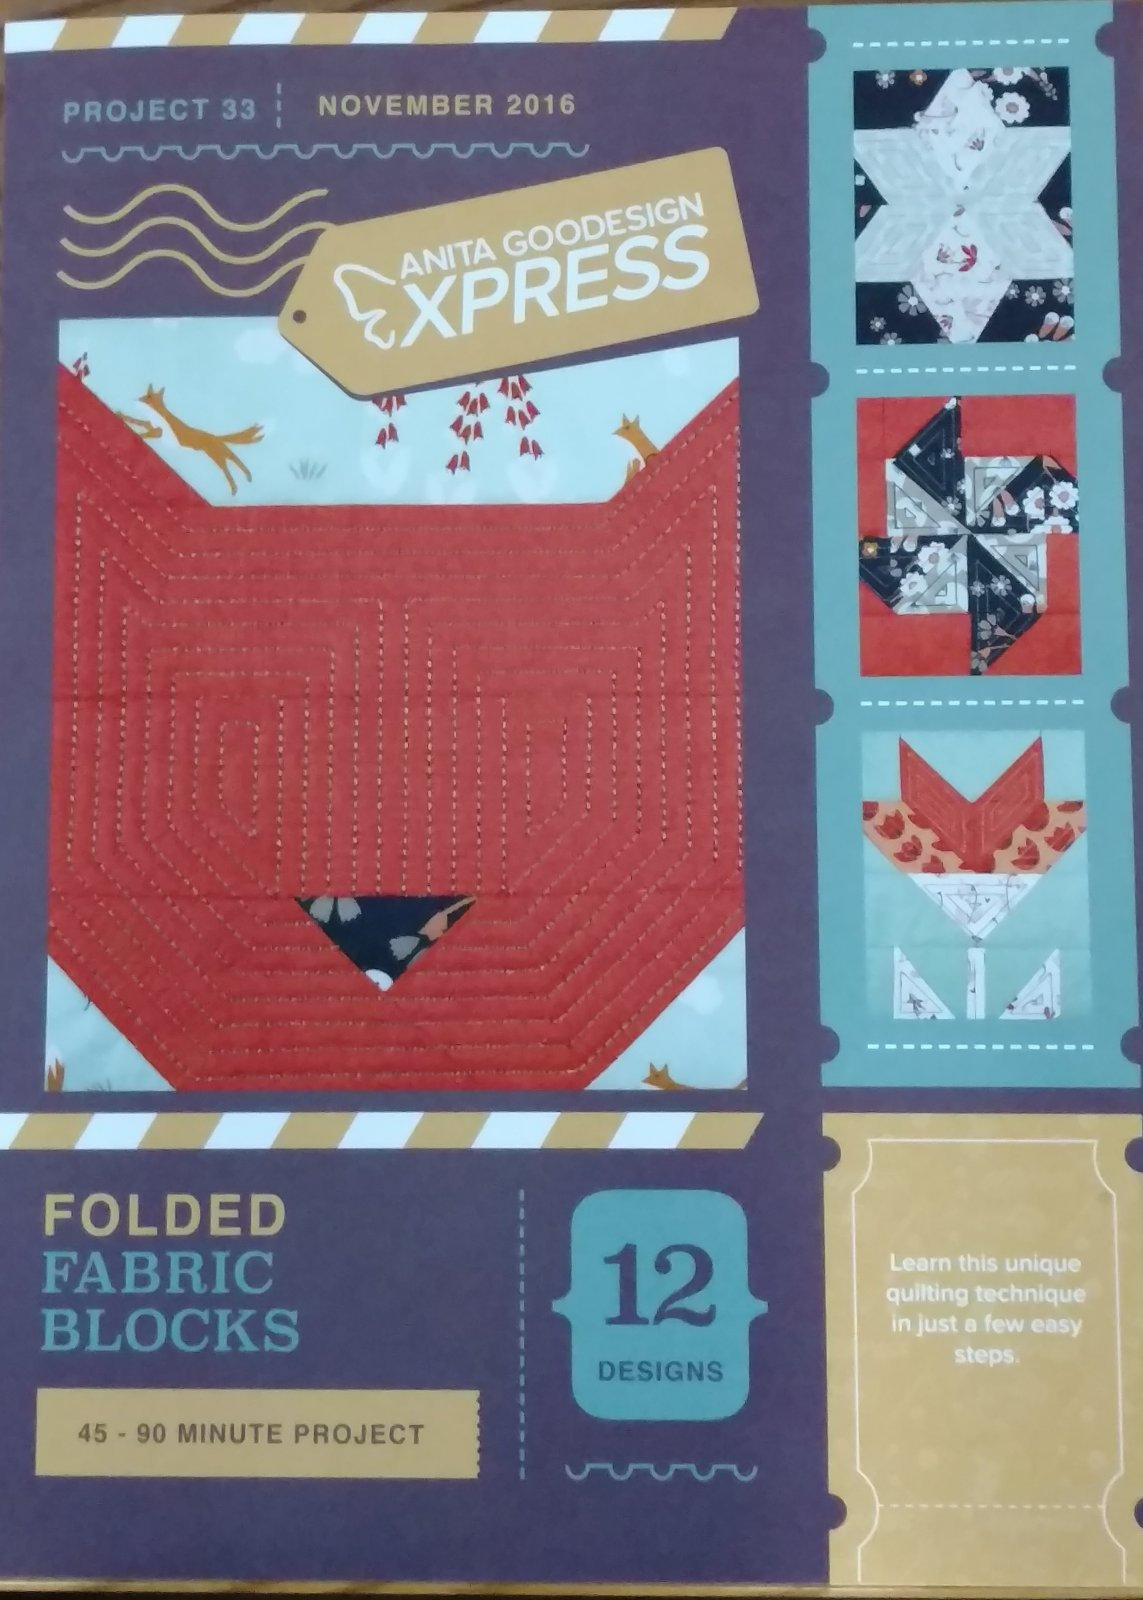 Anita Goodesign Express Folded Fabric Blocks